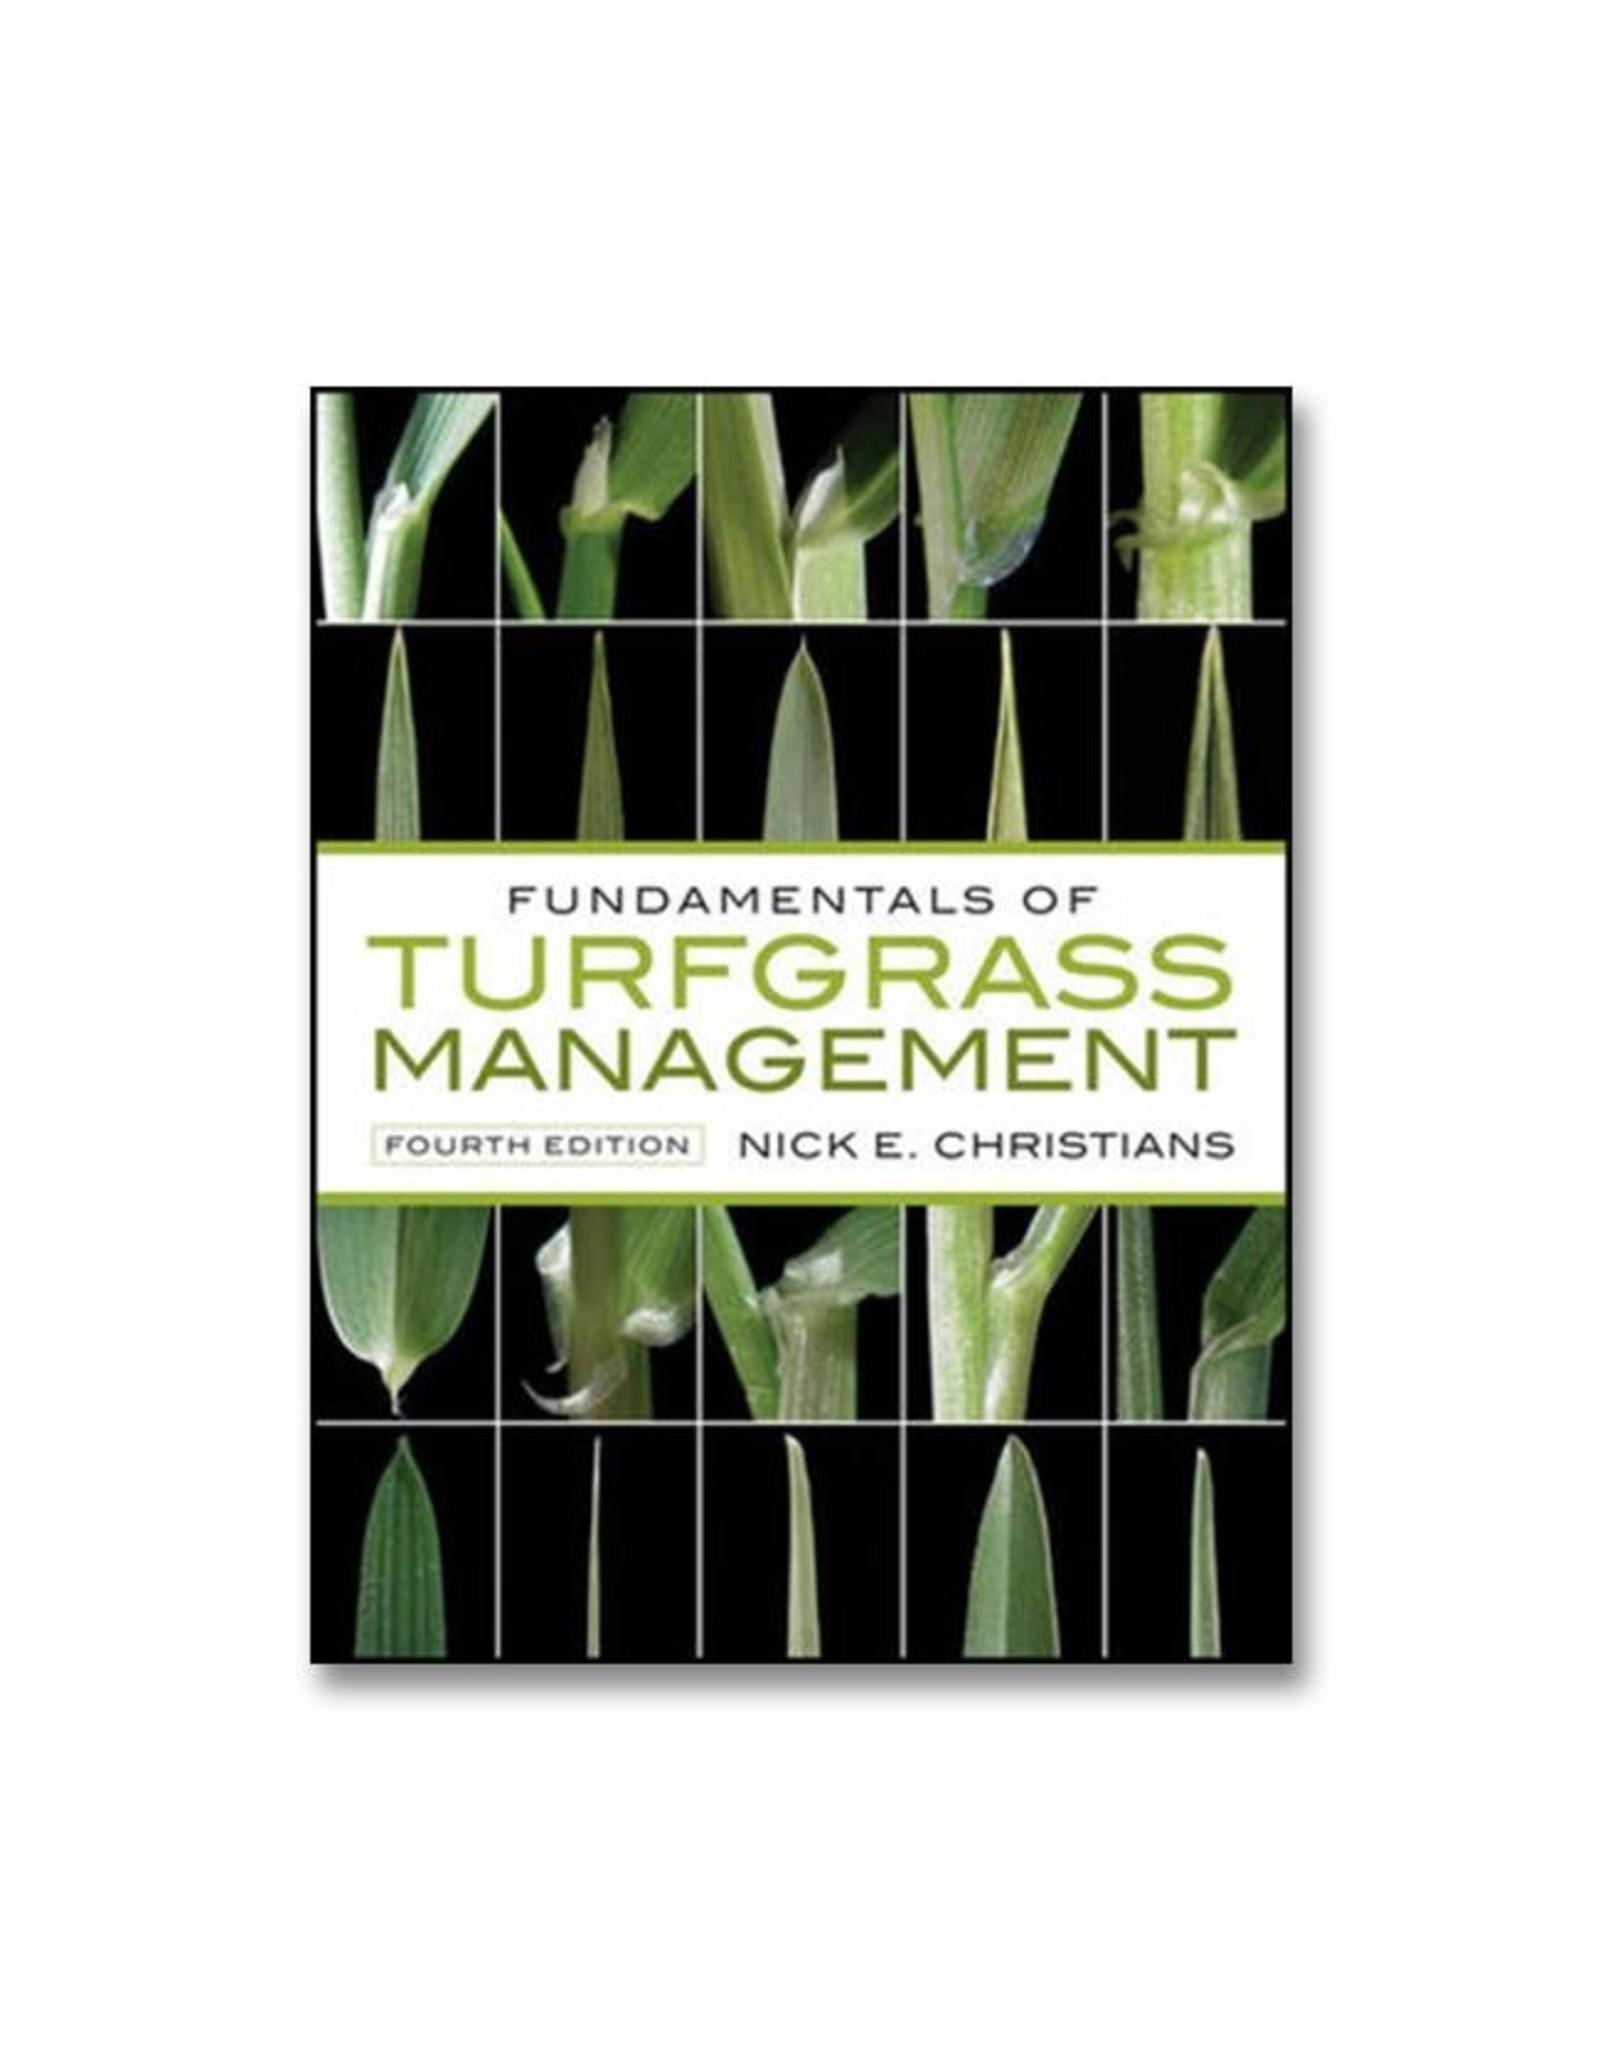 Fundamentals of Turfgrass Management - 4th Ed.